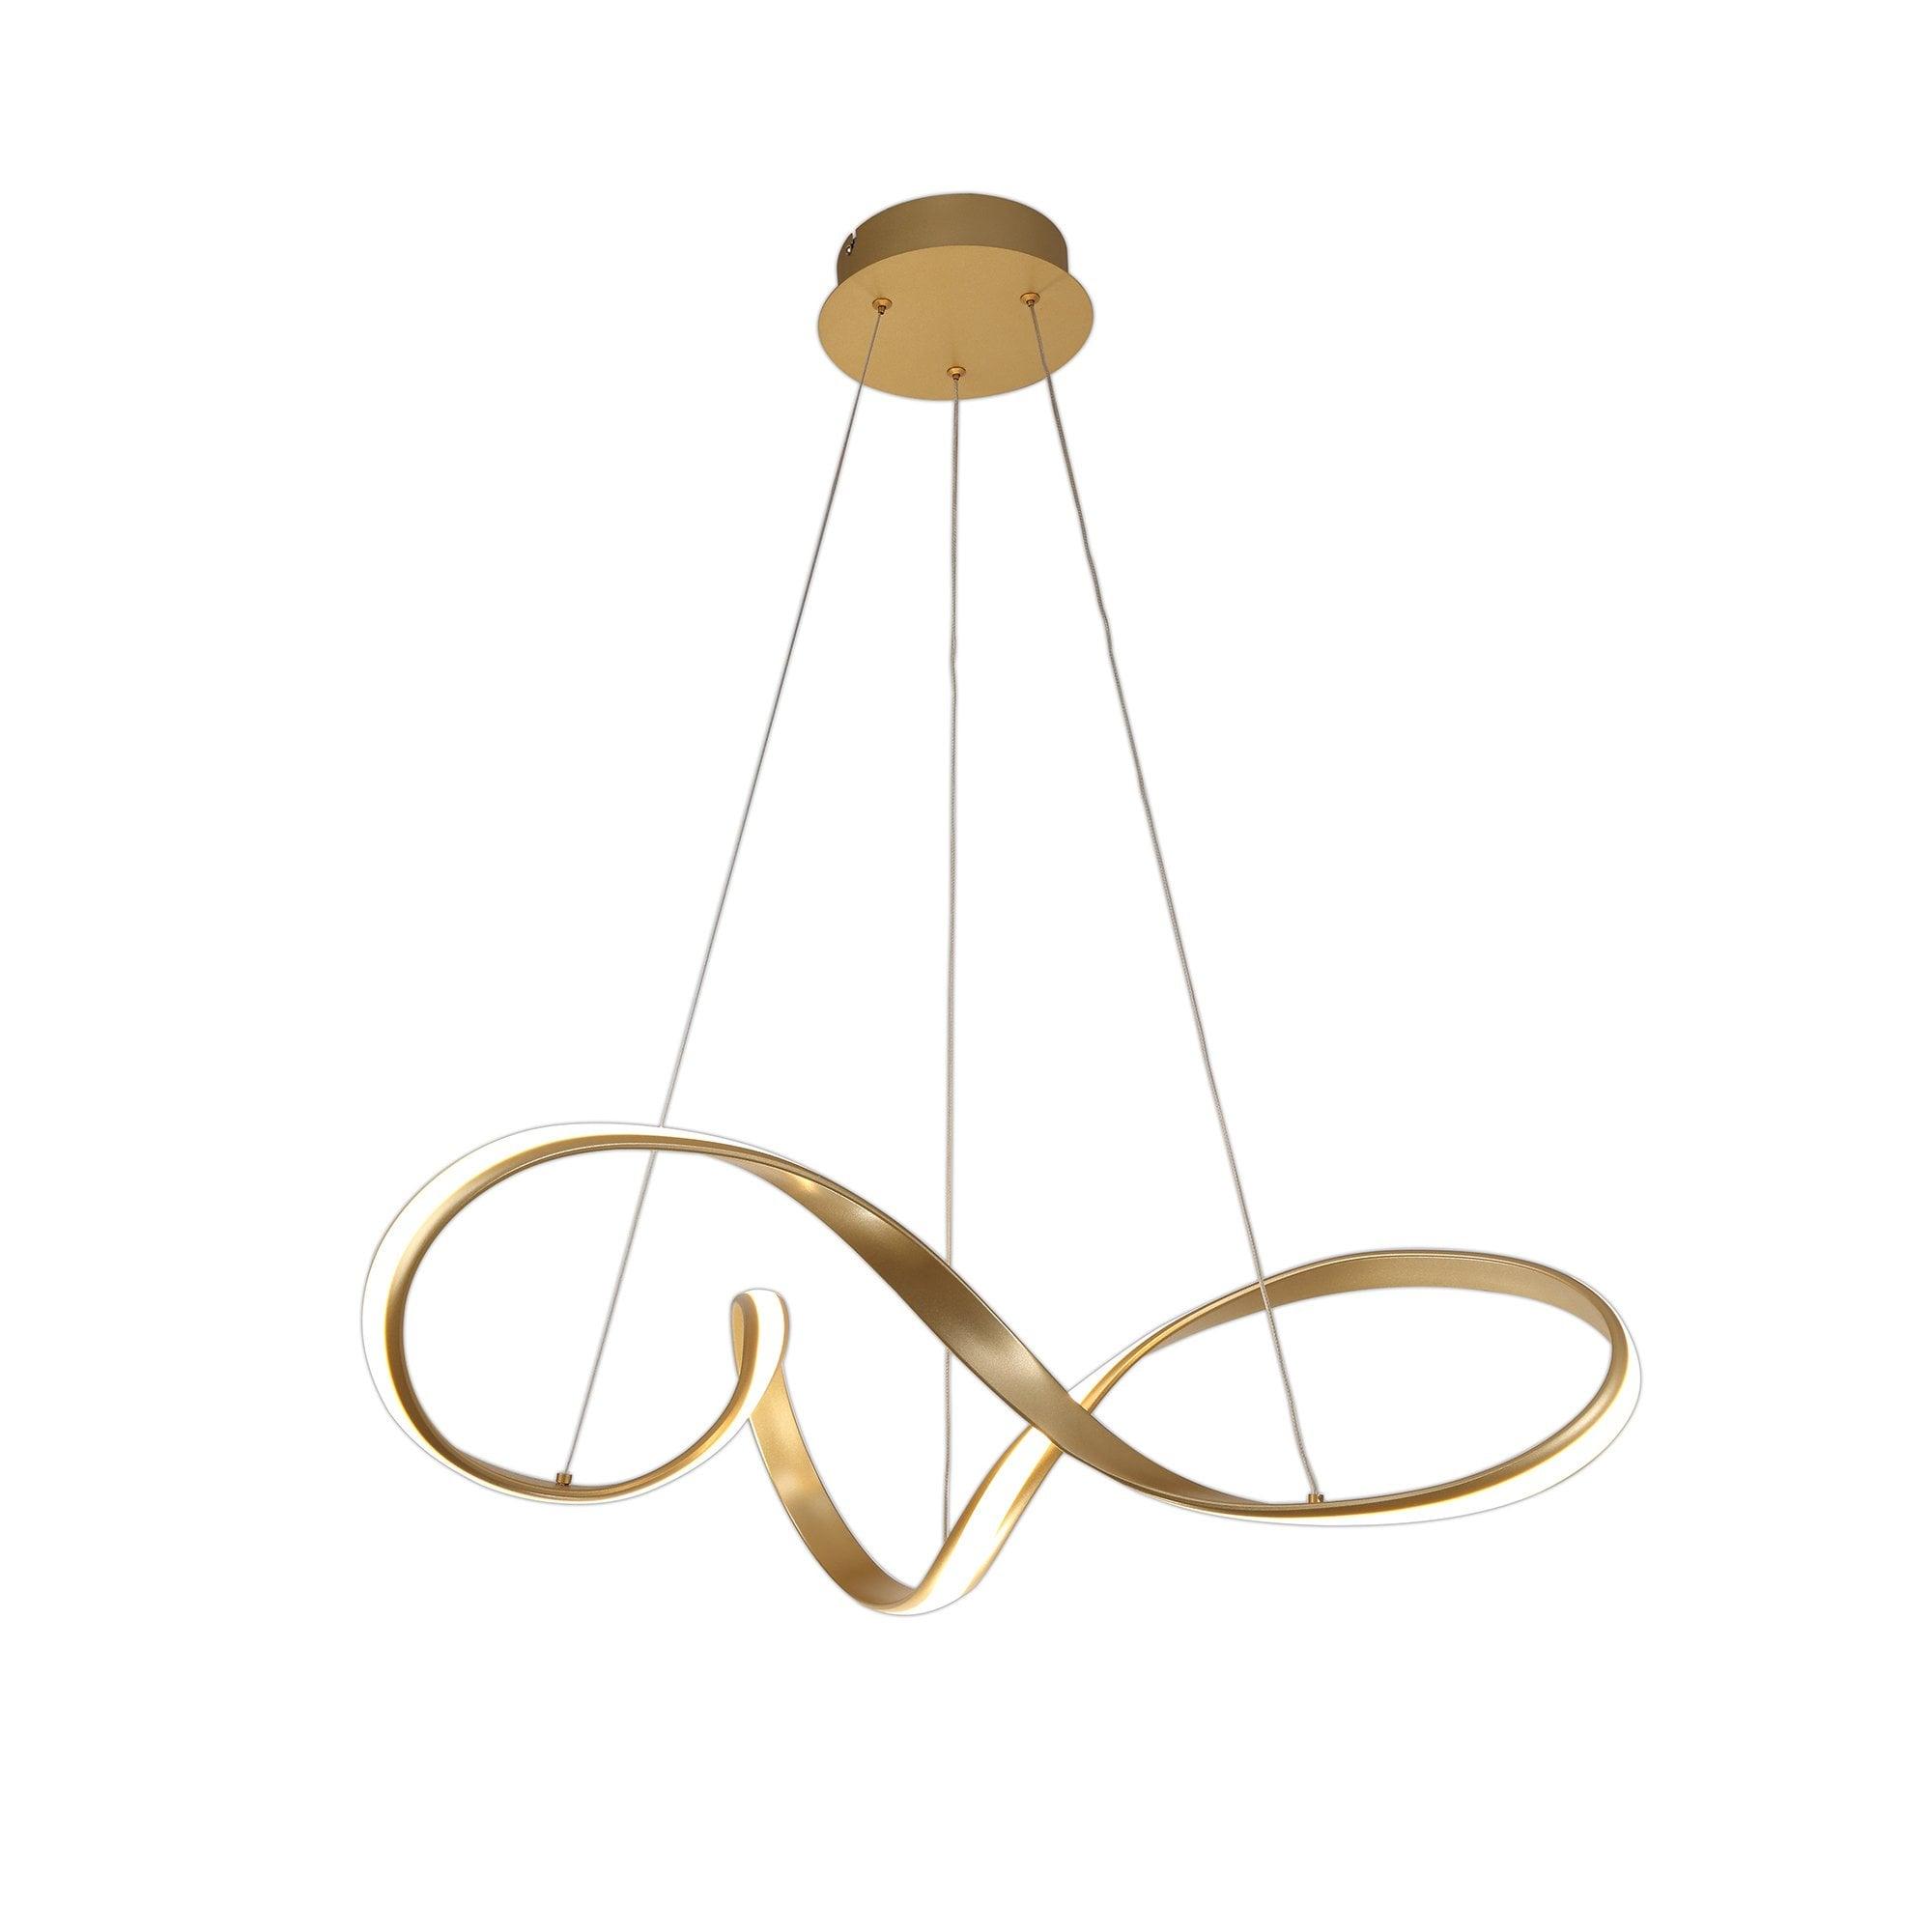 1 Light Ceiling Pendant Sand Gold Large